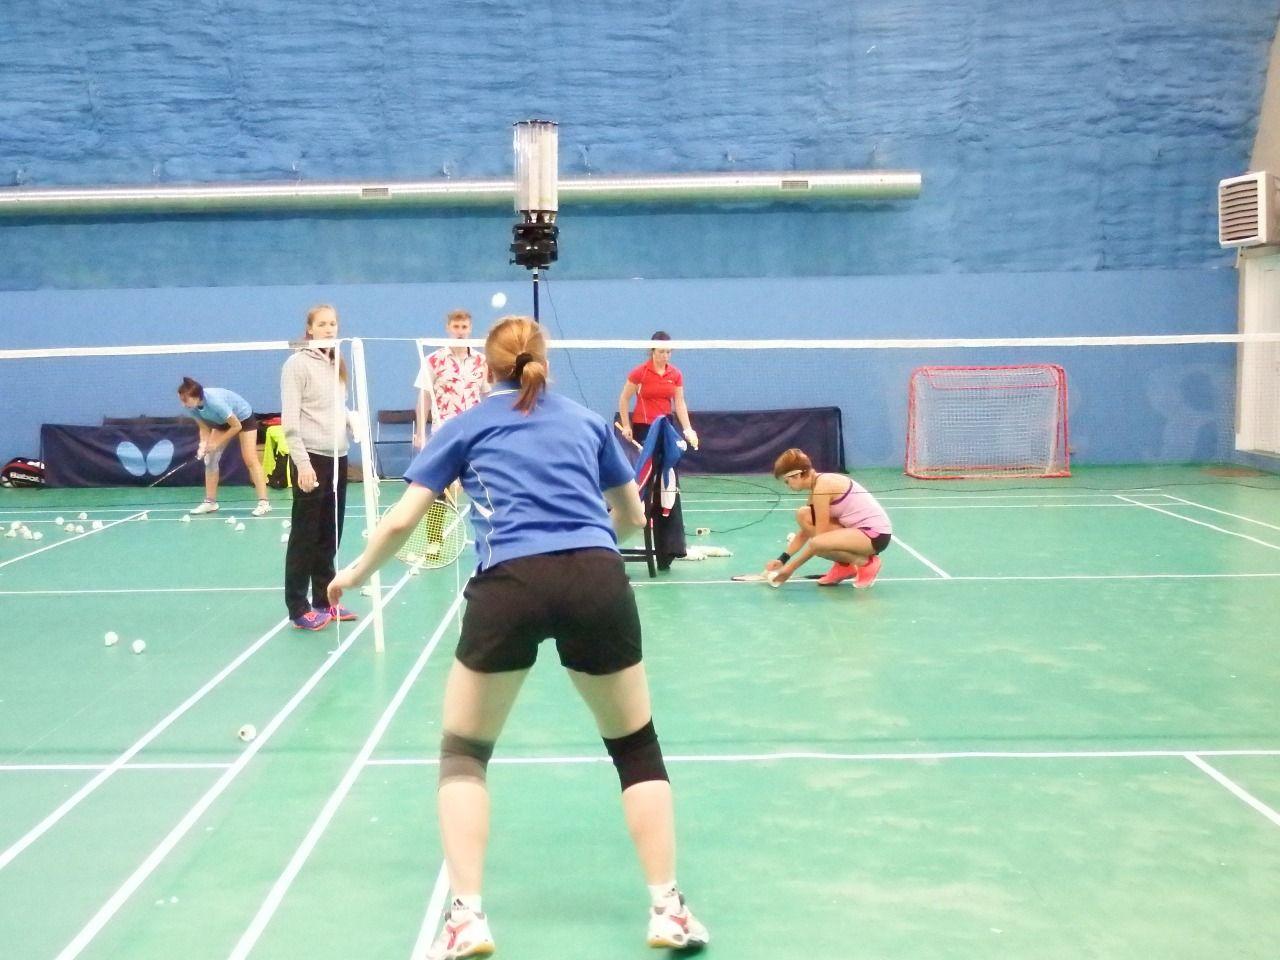 Badminton Machine Badminton Shuttlecocks Sports